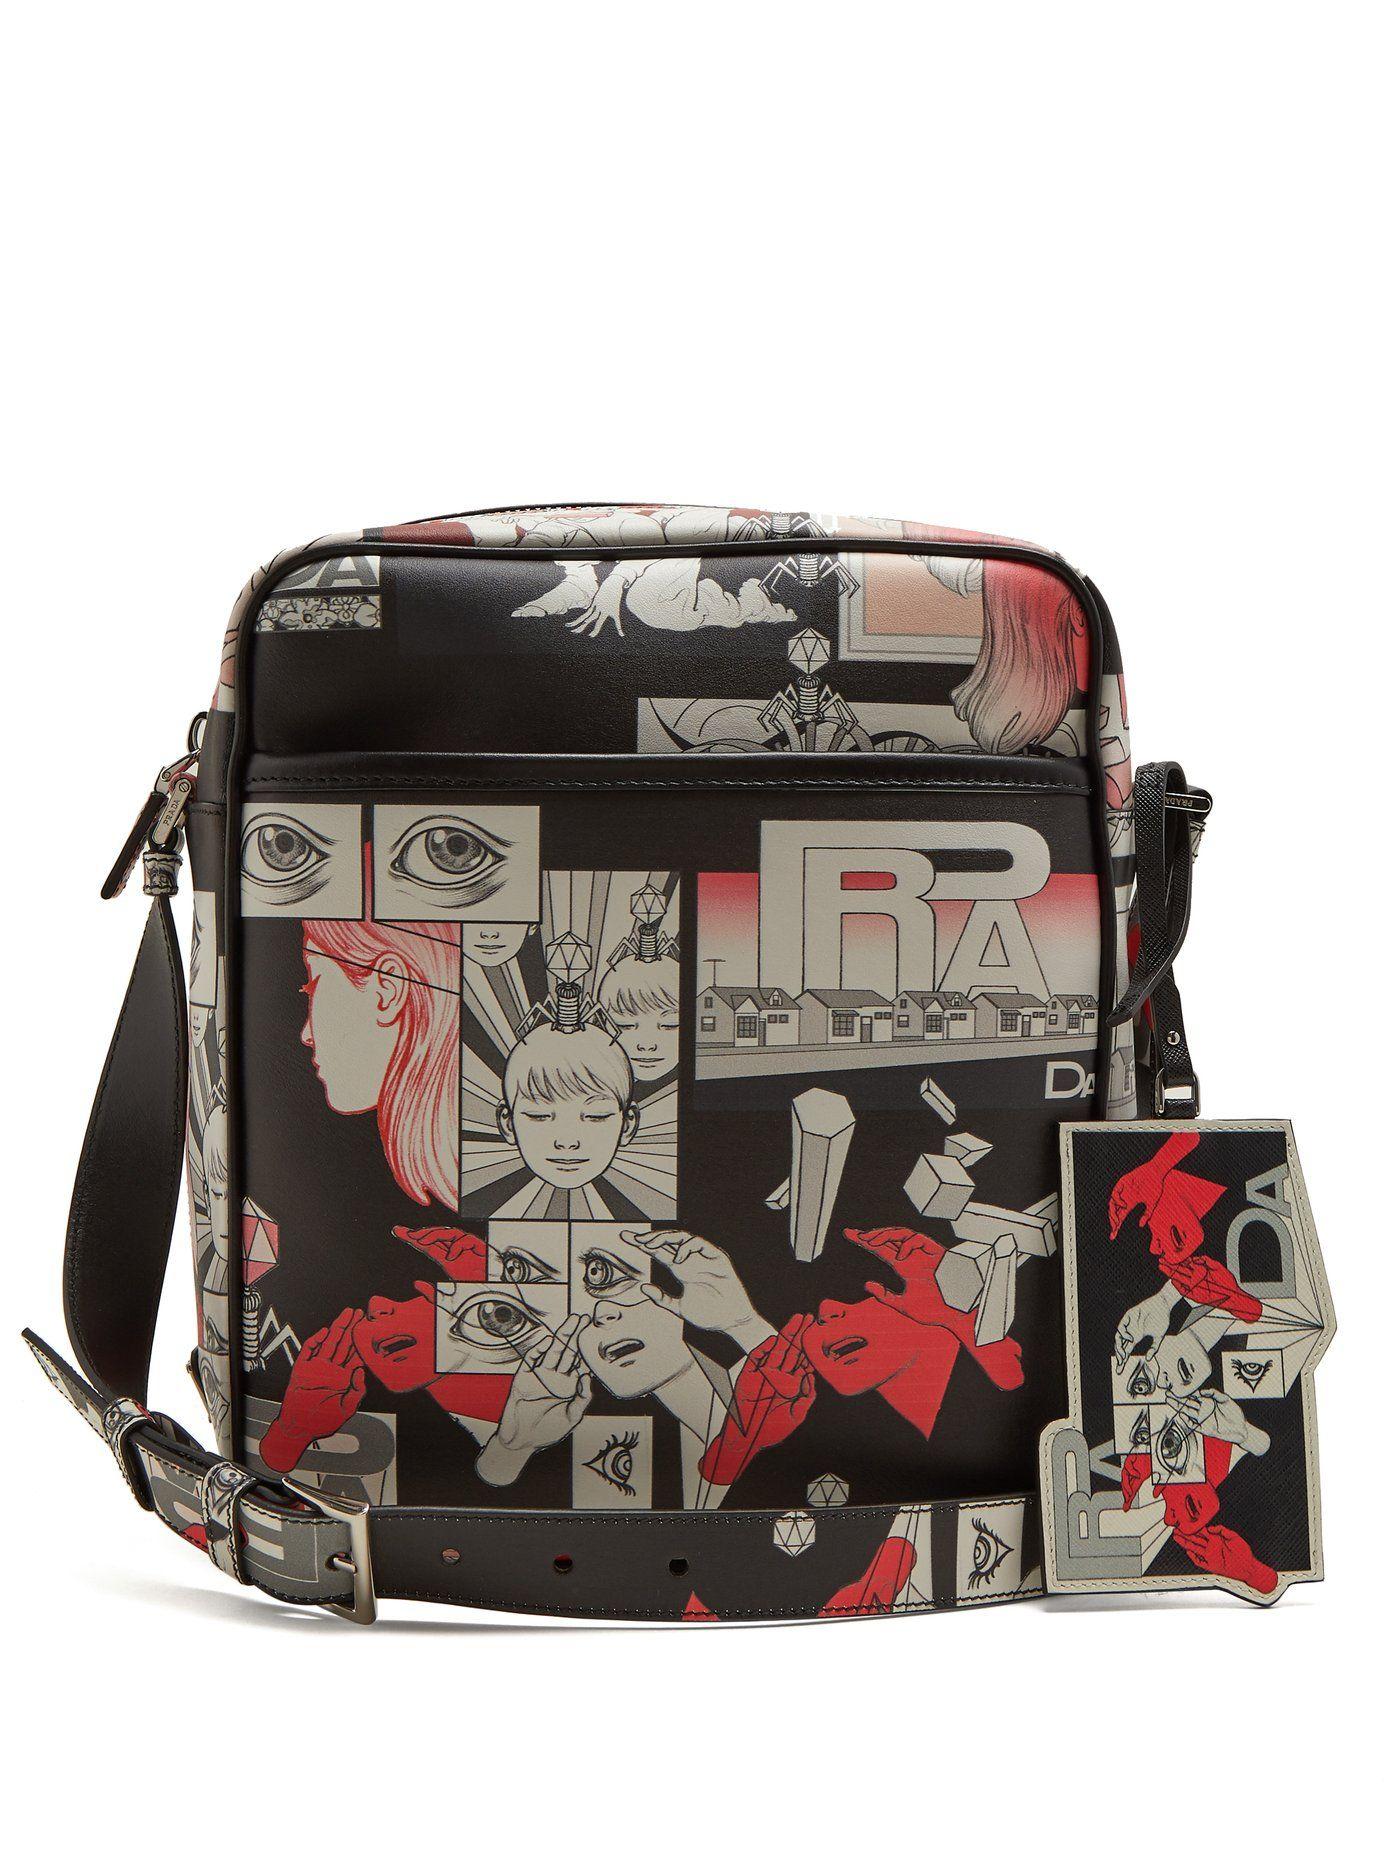 43c01ea341fd Prada Comic-strip print leather messenger bag | Bags | Prada ...